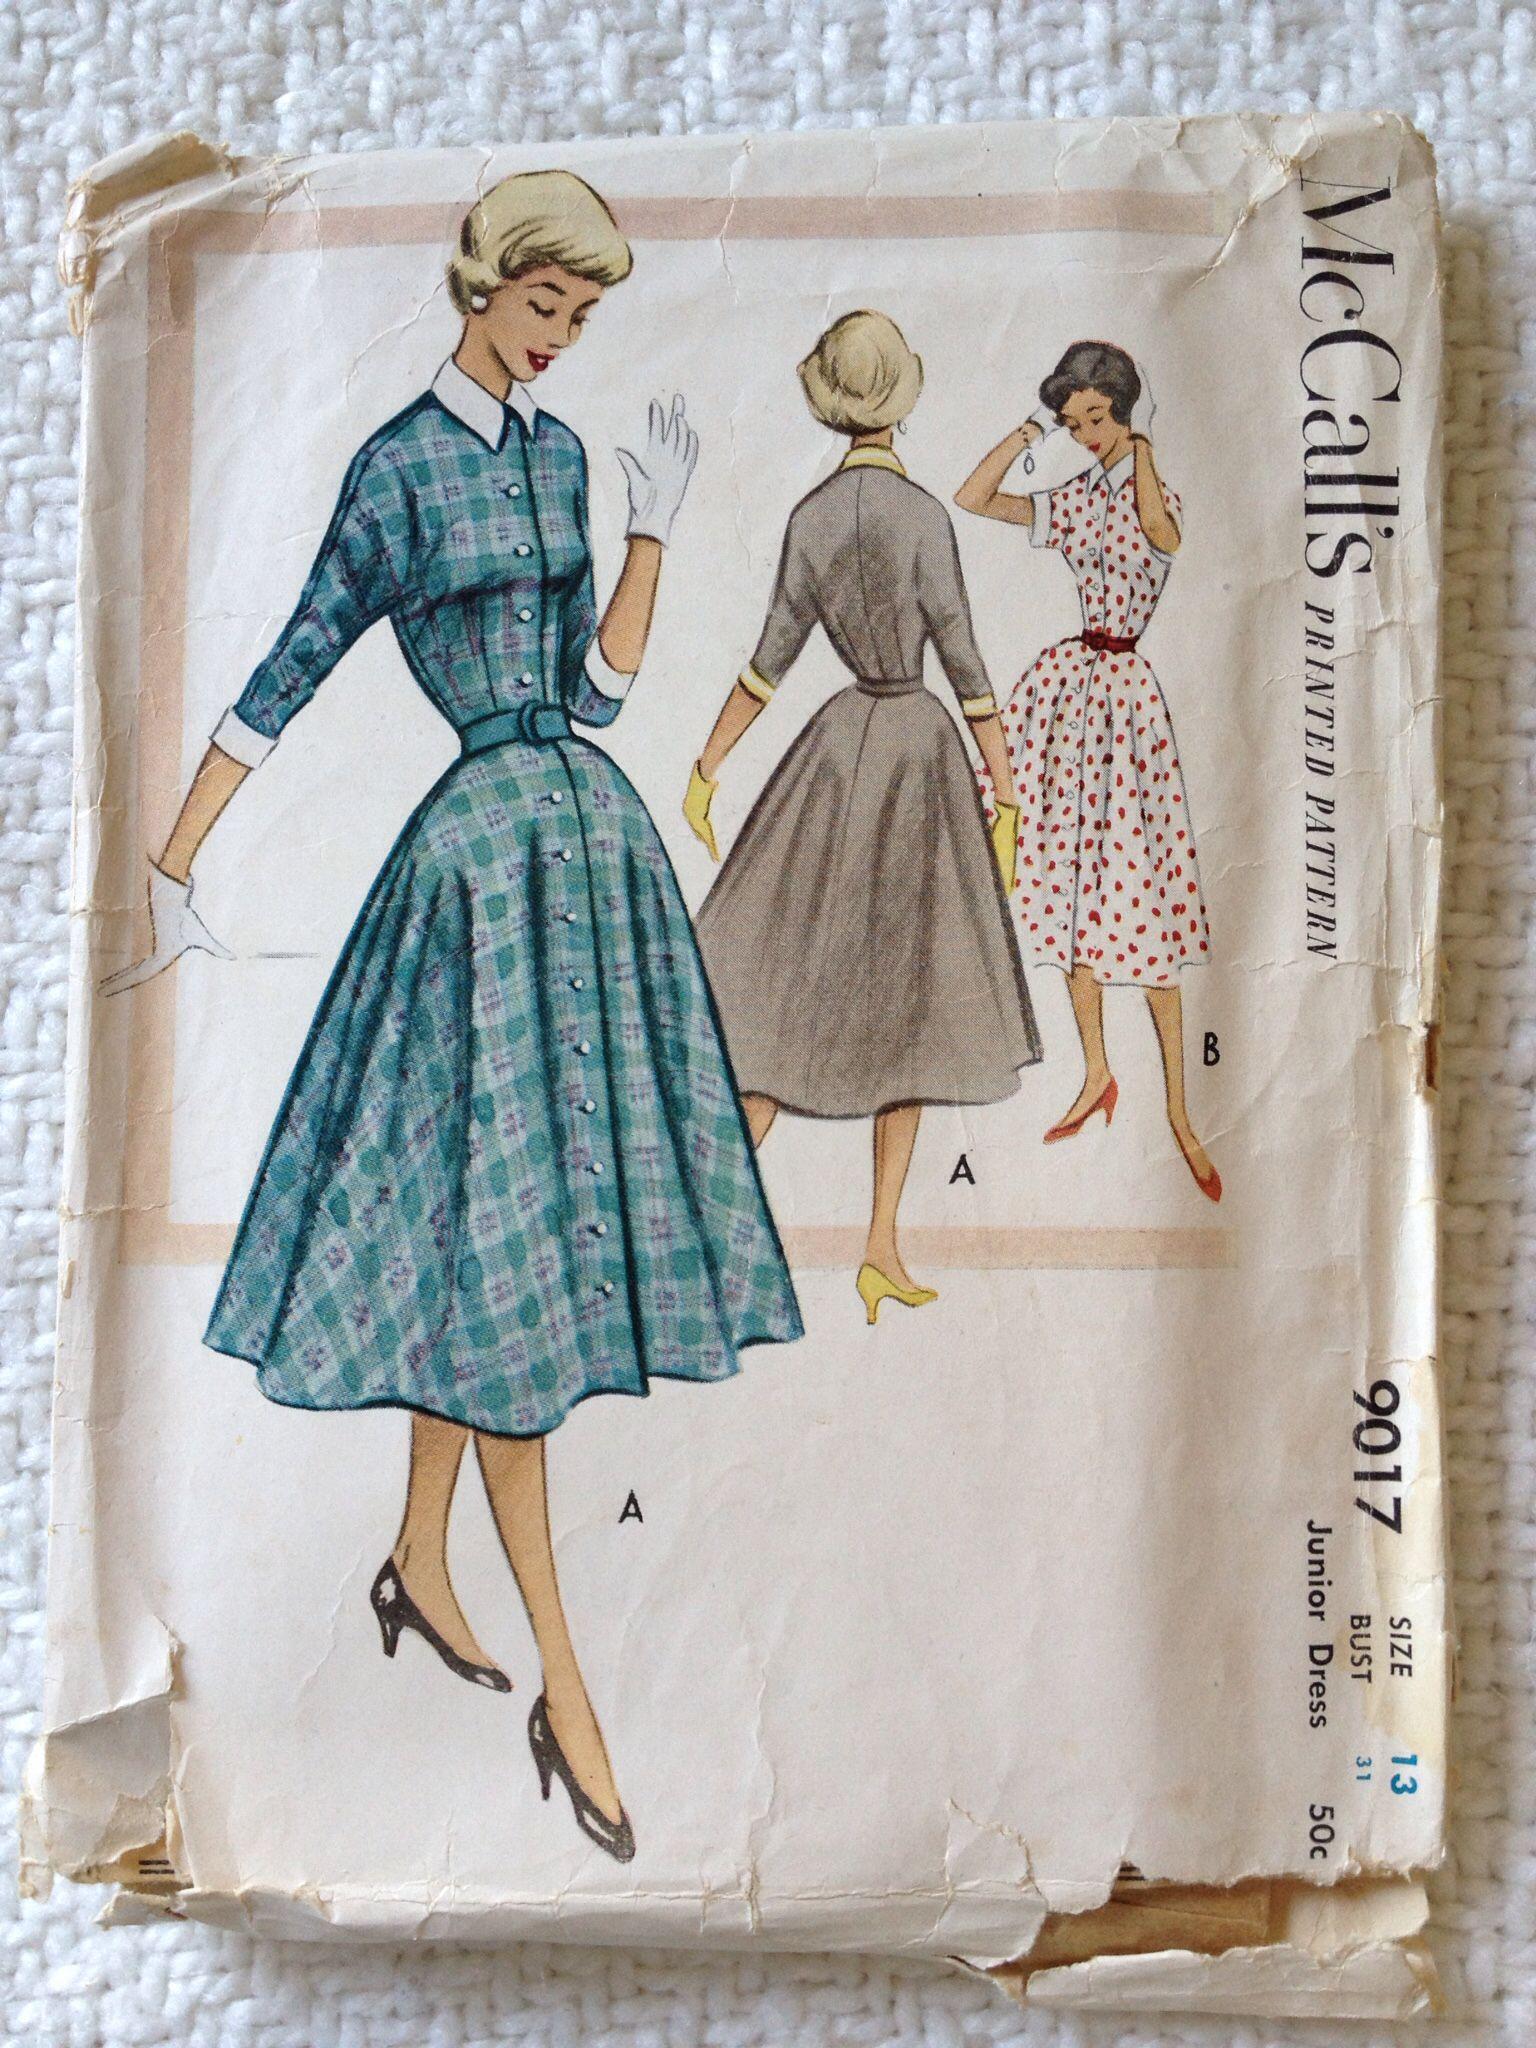 Mccalls 9017 size13 junior dress 1952